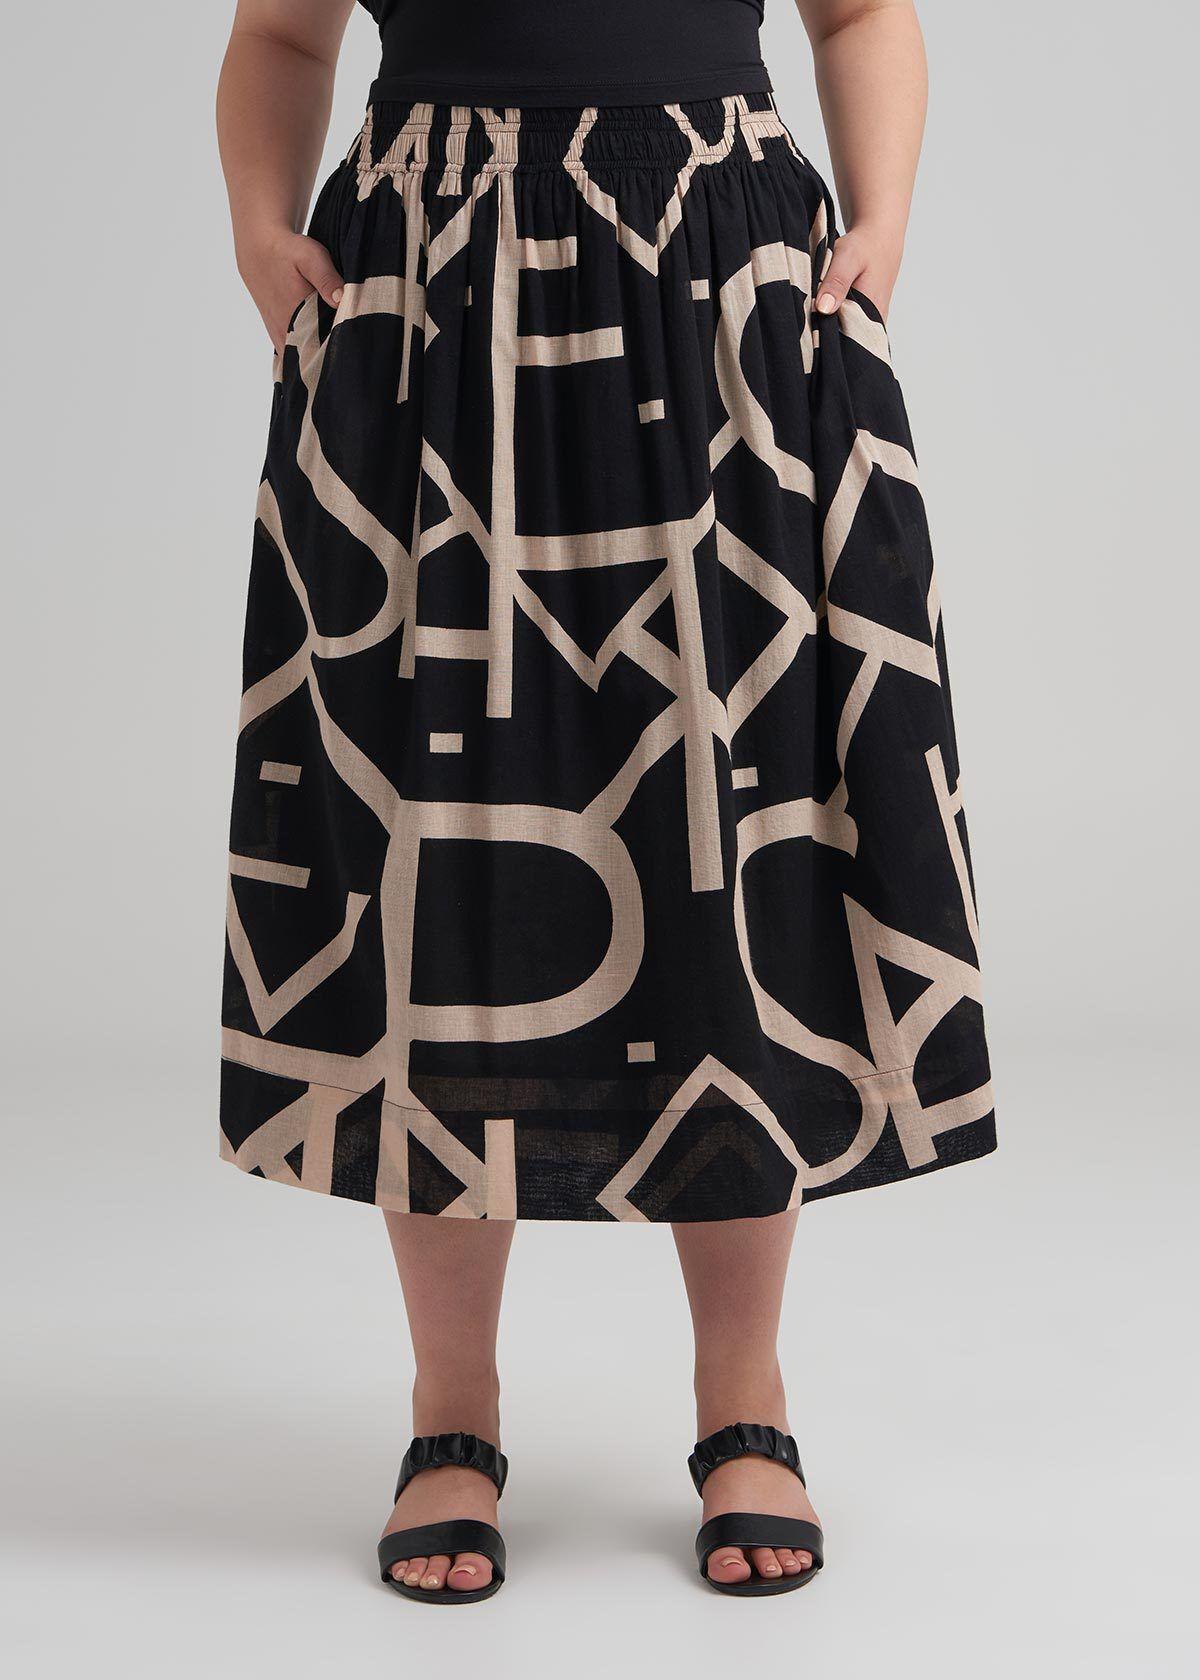 Plus Size Bottoms | Jeans, Shorts, Skirts & Leggings